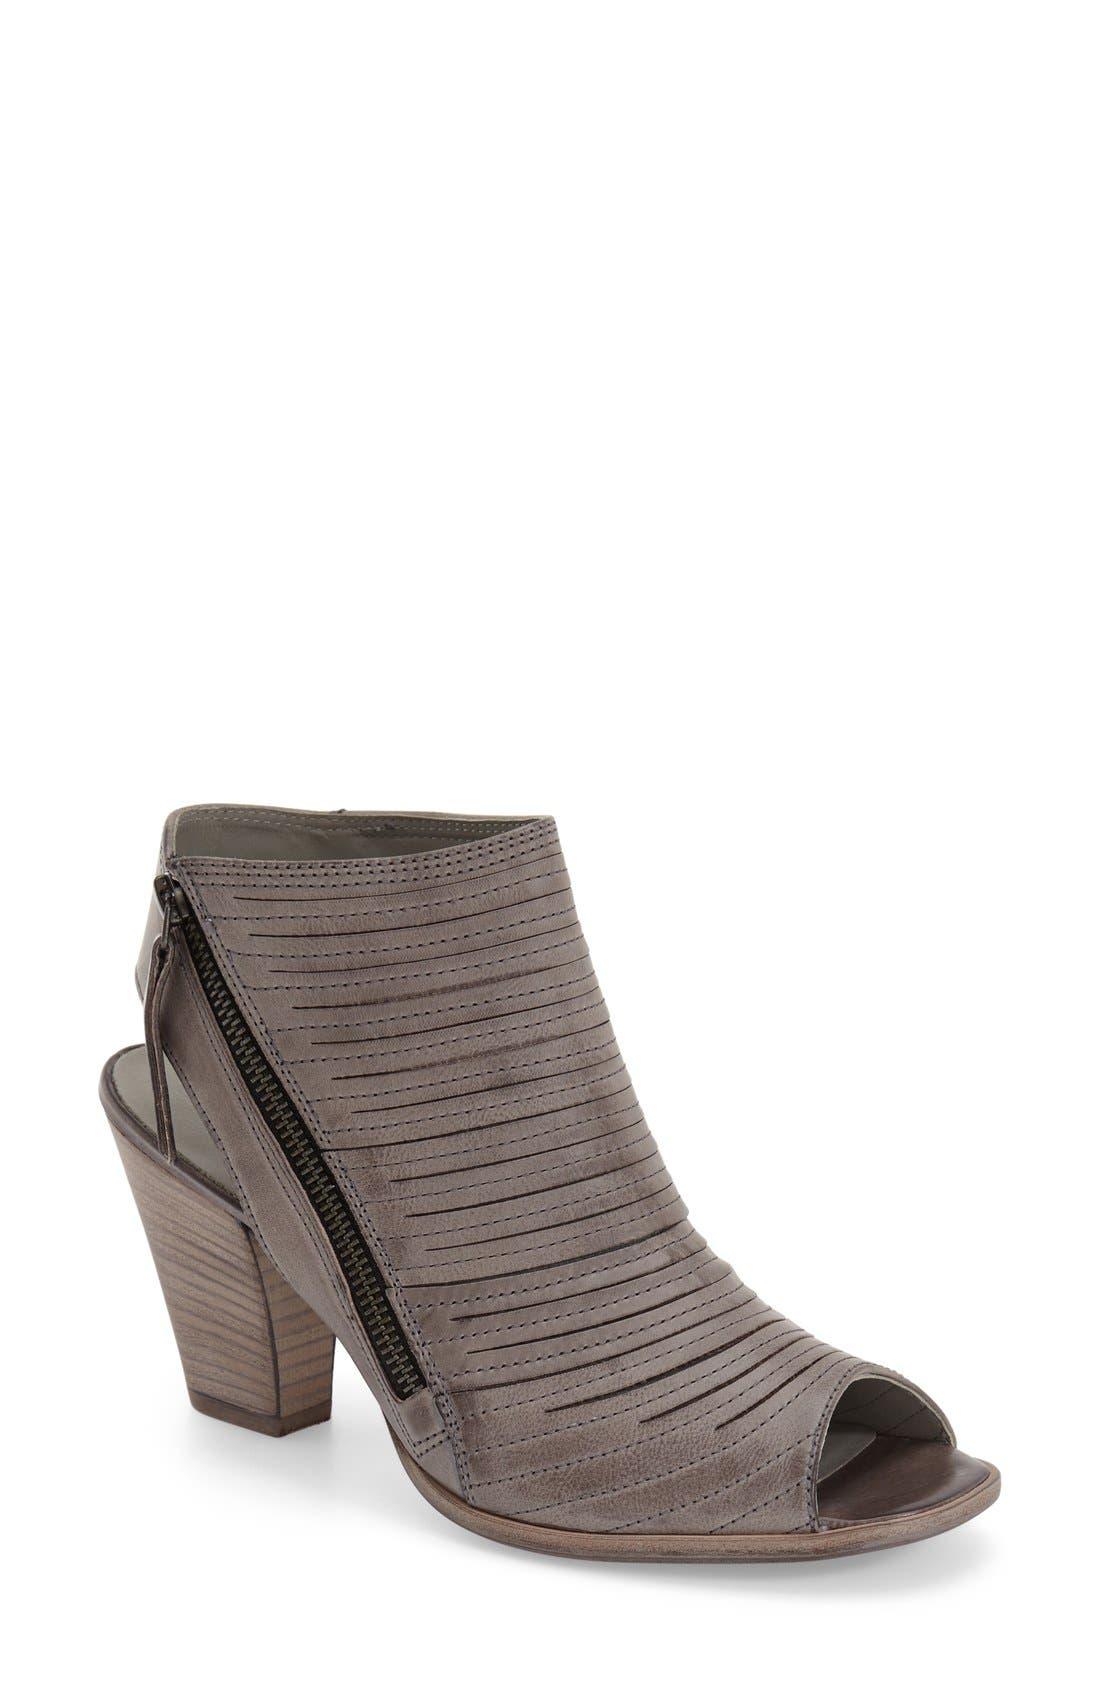 'Cayanne' Leather Peep Toe Sandal,                             Main thumbnail 7, color,